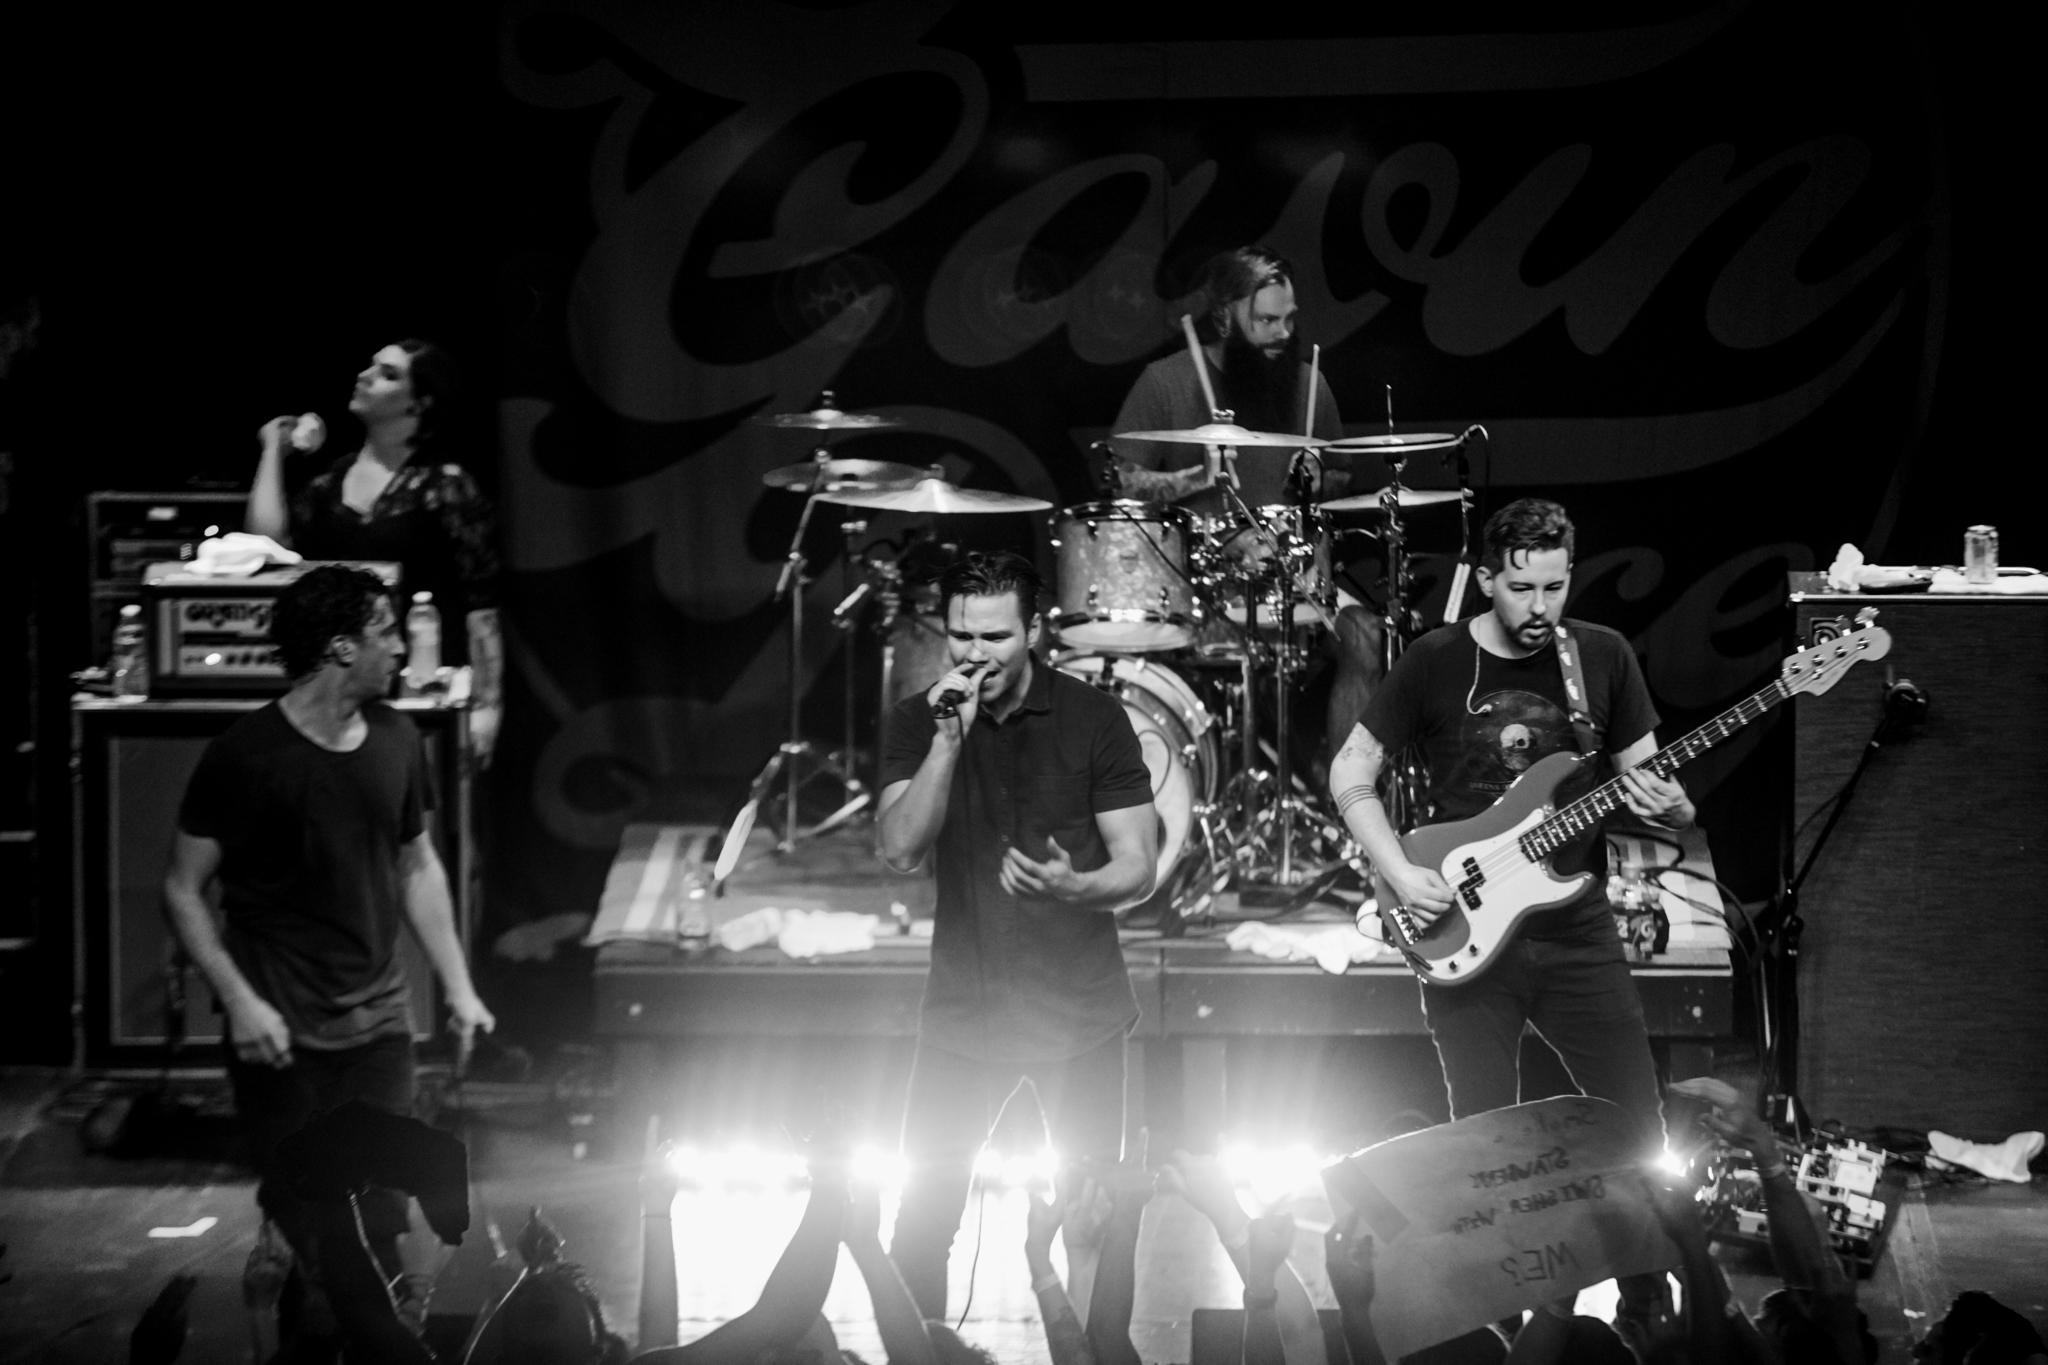 Lafferty Photo - Dance Gavin Dance 03.08.17-8664.jpg